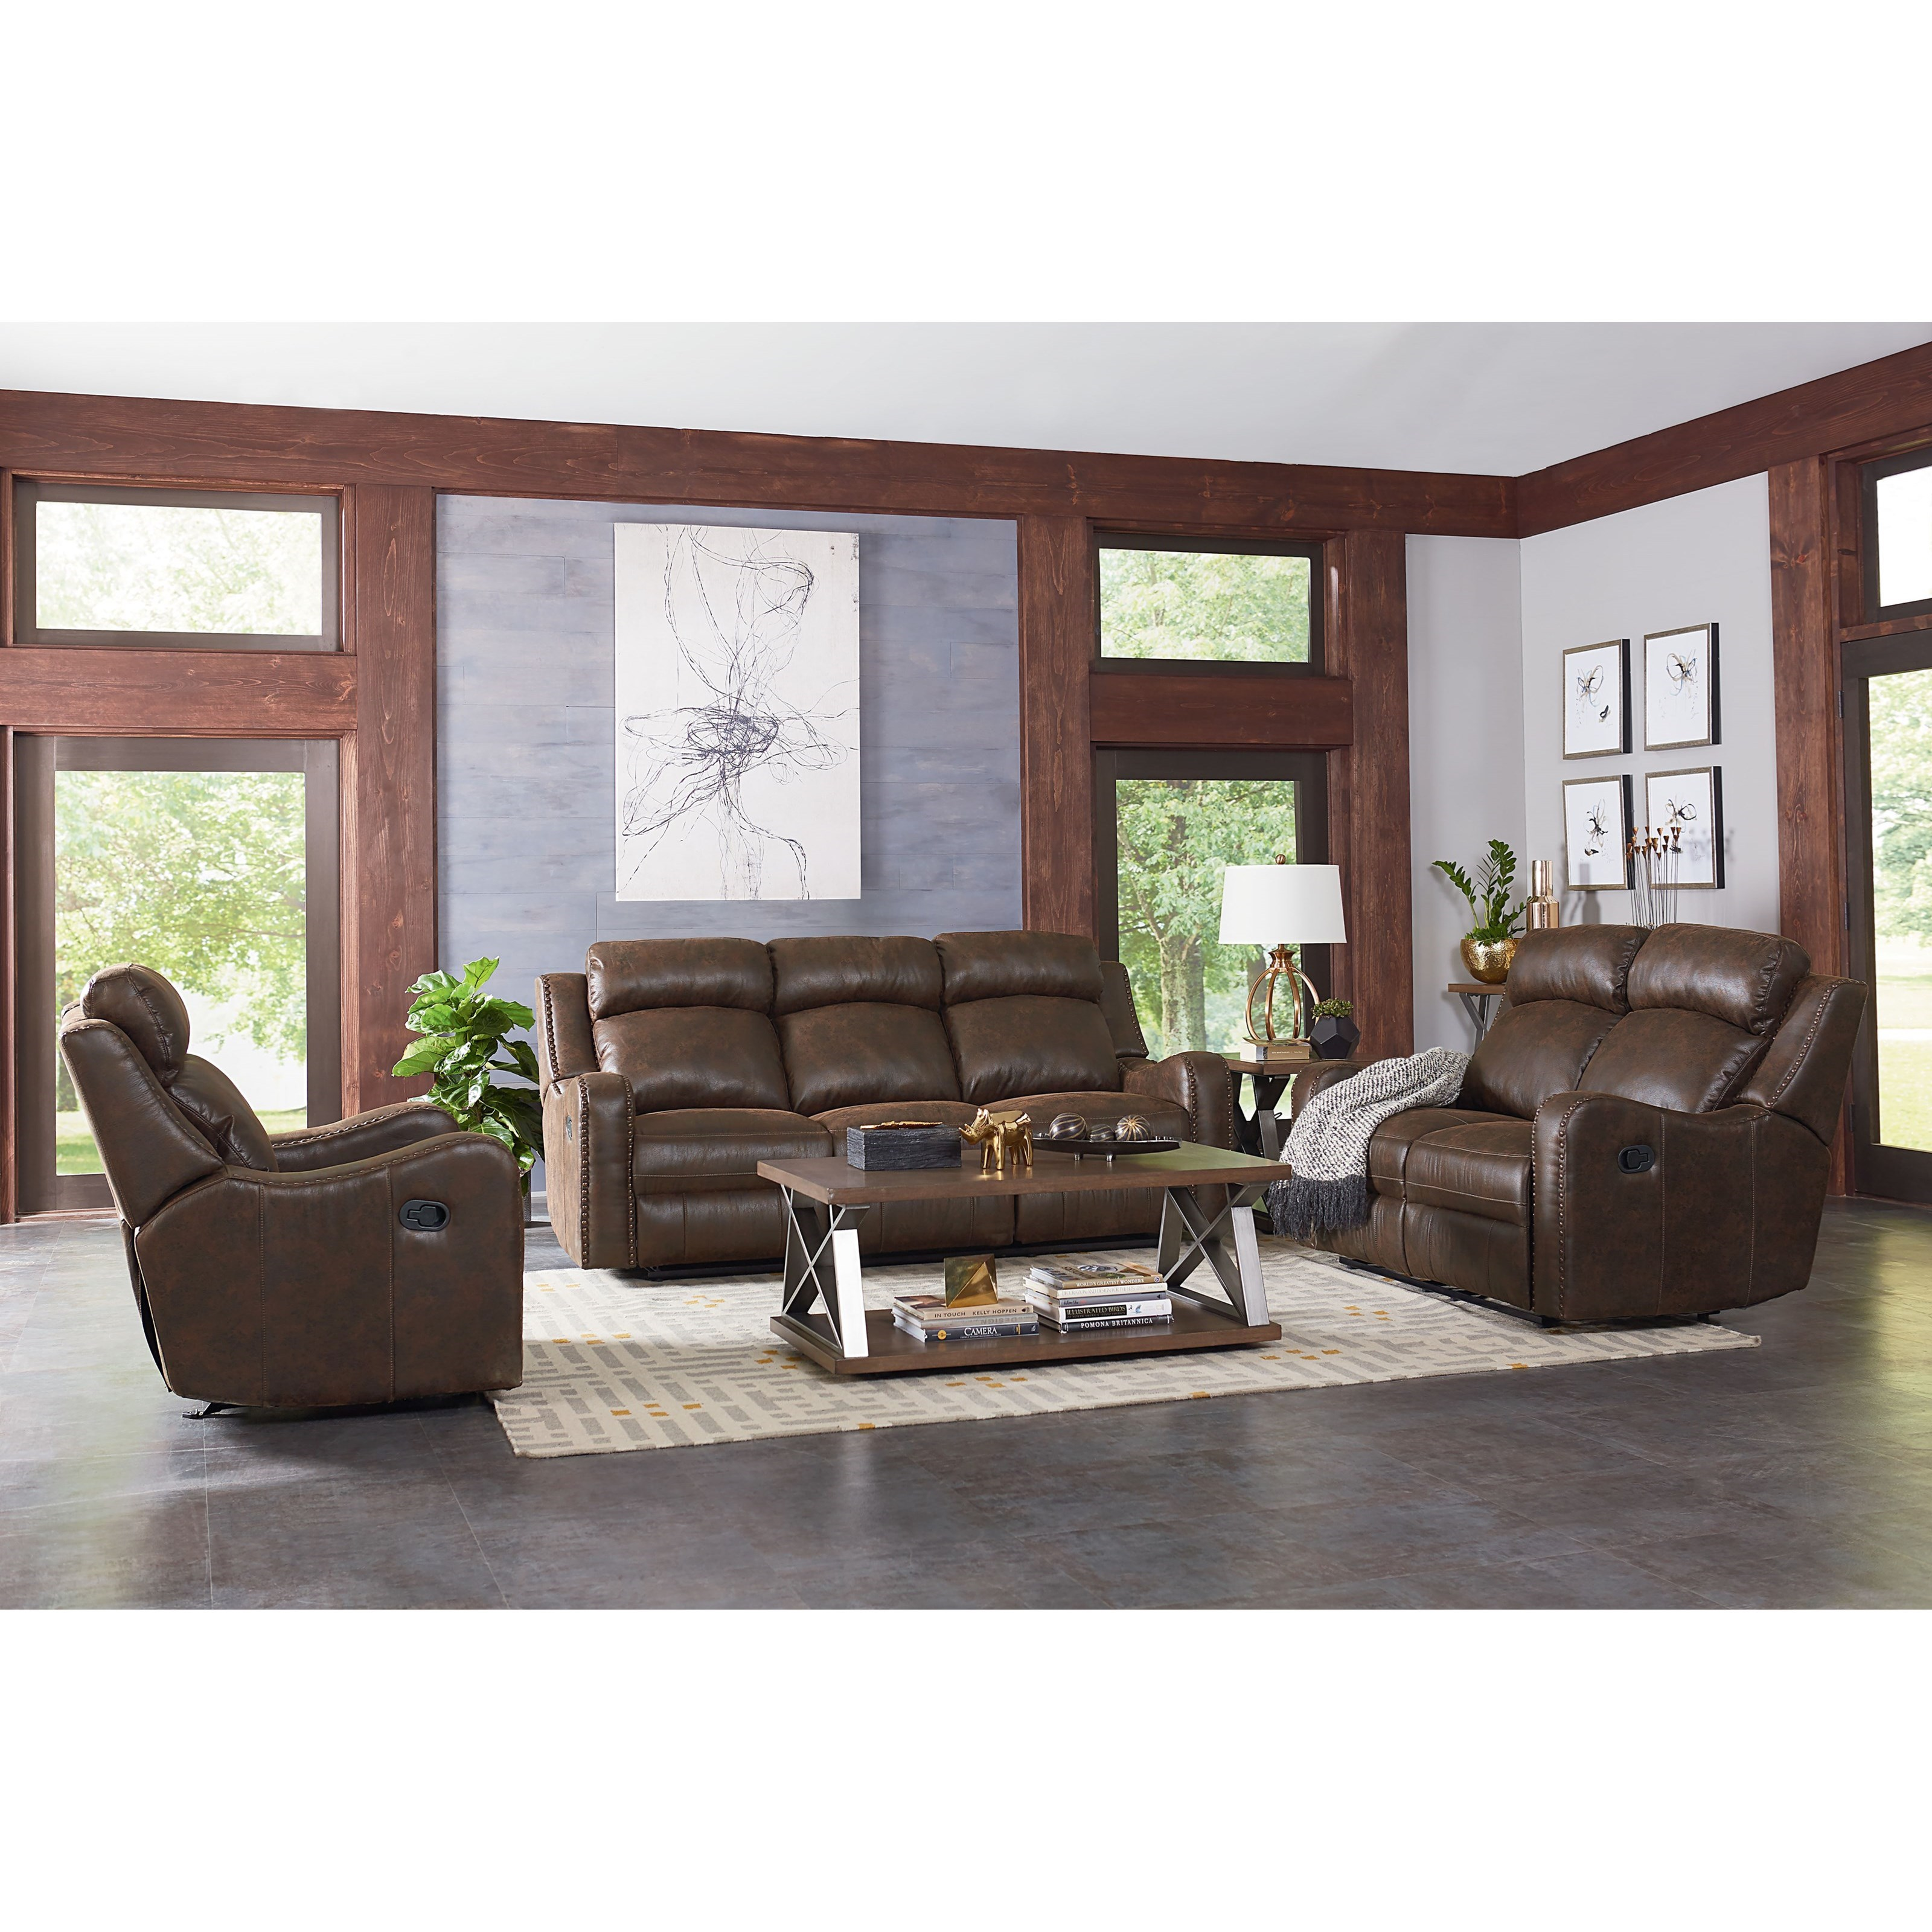 Standard Furniture Bankston Power Reclining Living Room Group - Item Number: 414800 Brown Power Reclining Group